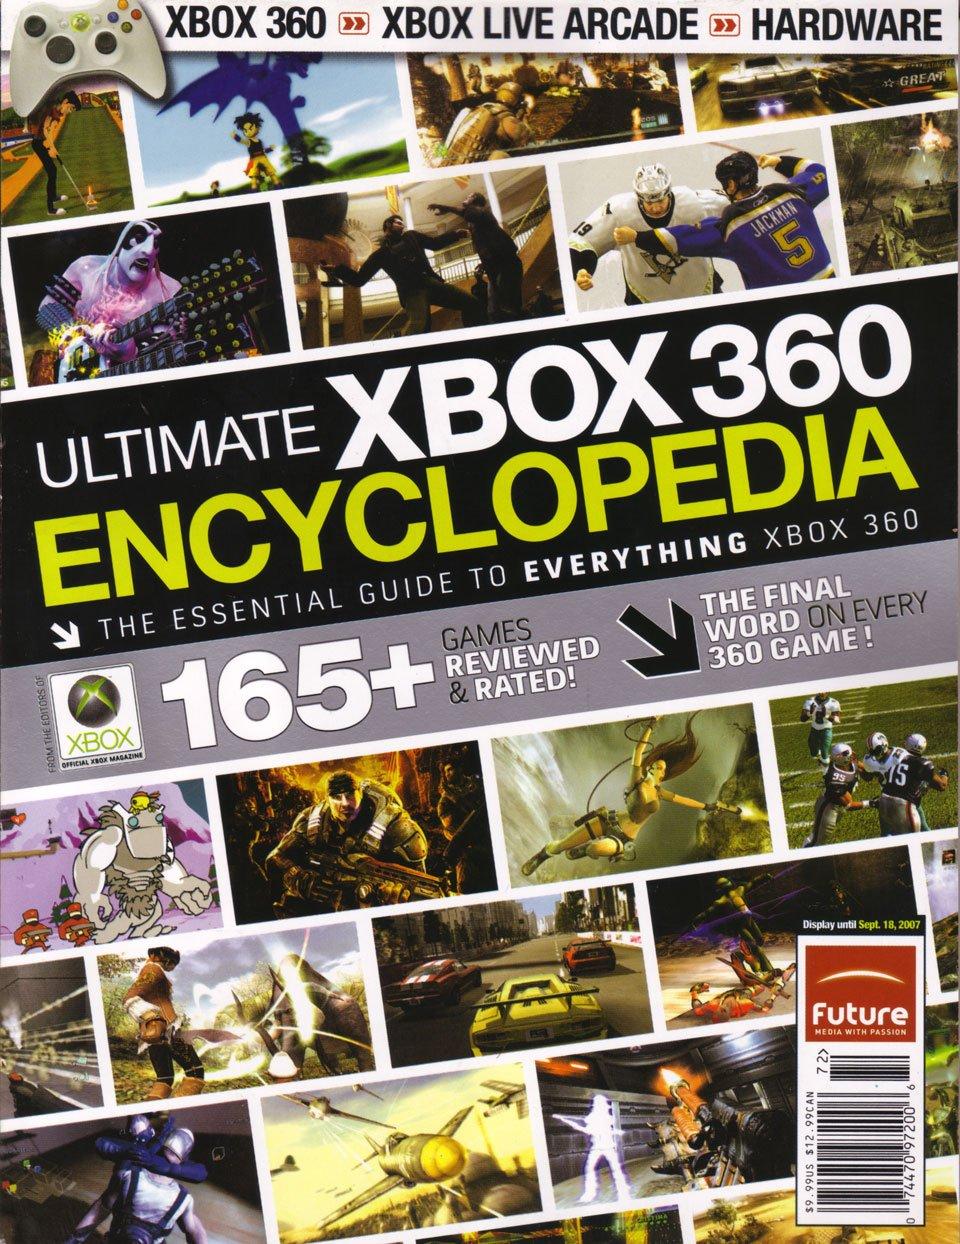 Ultimate XBox 360 Encyclopedia